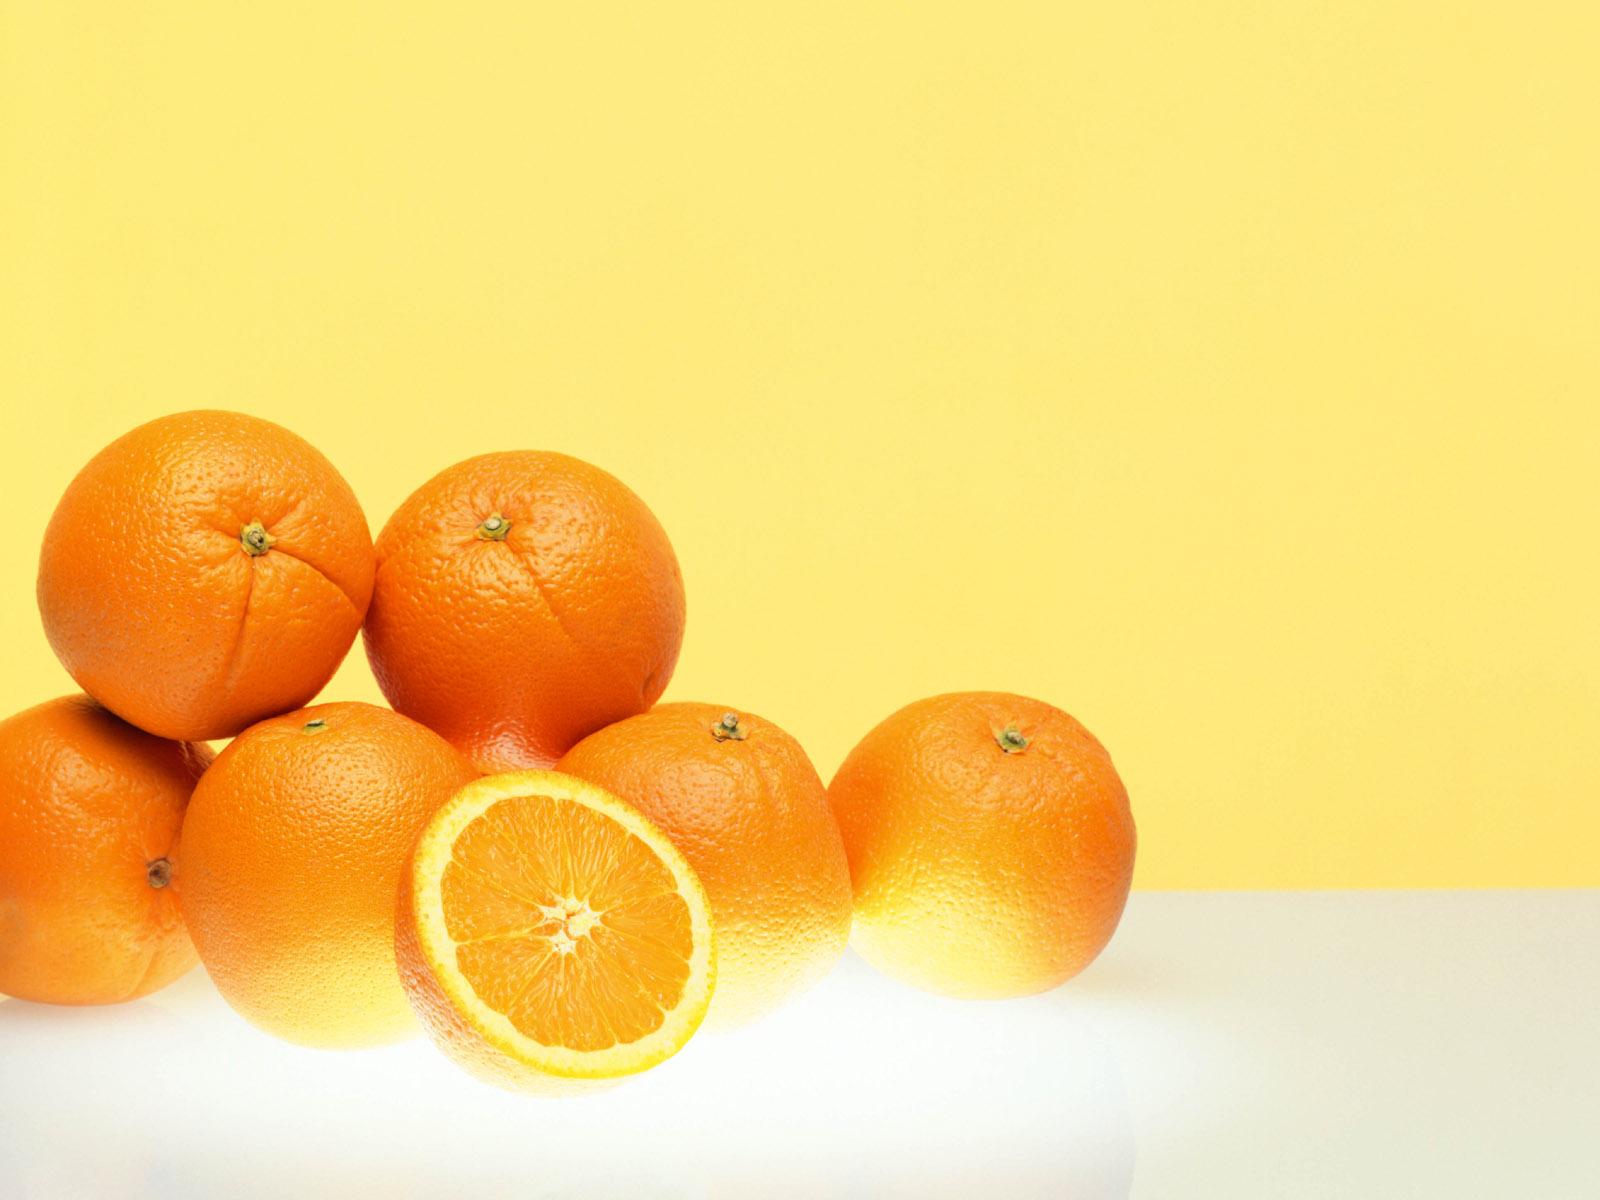 rolf sams fruits desktop wallpapers 1600x1200